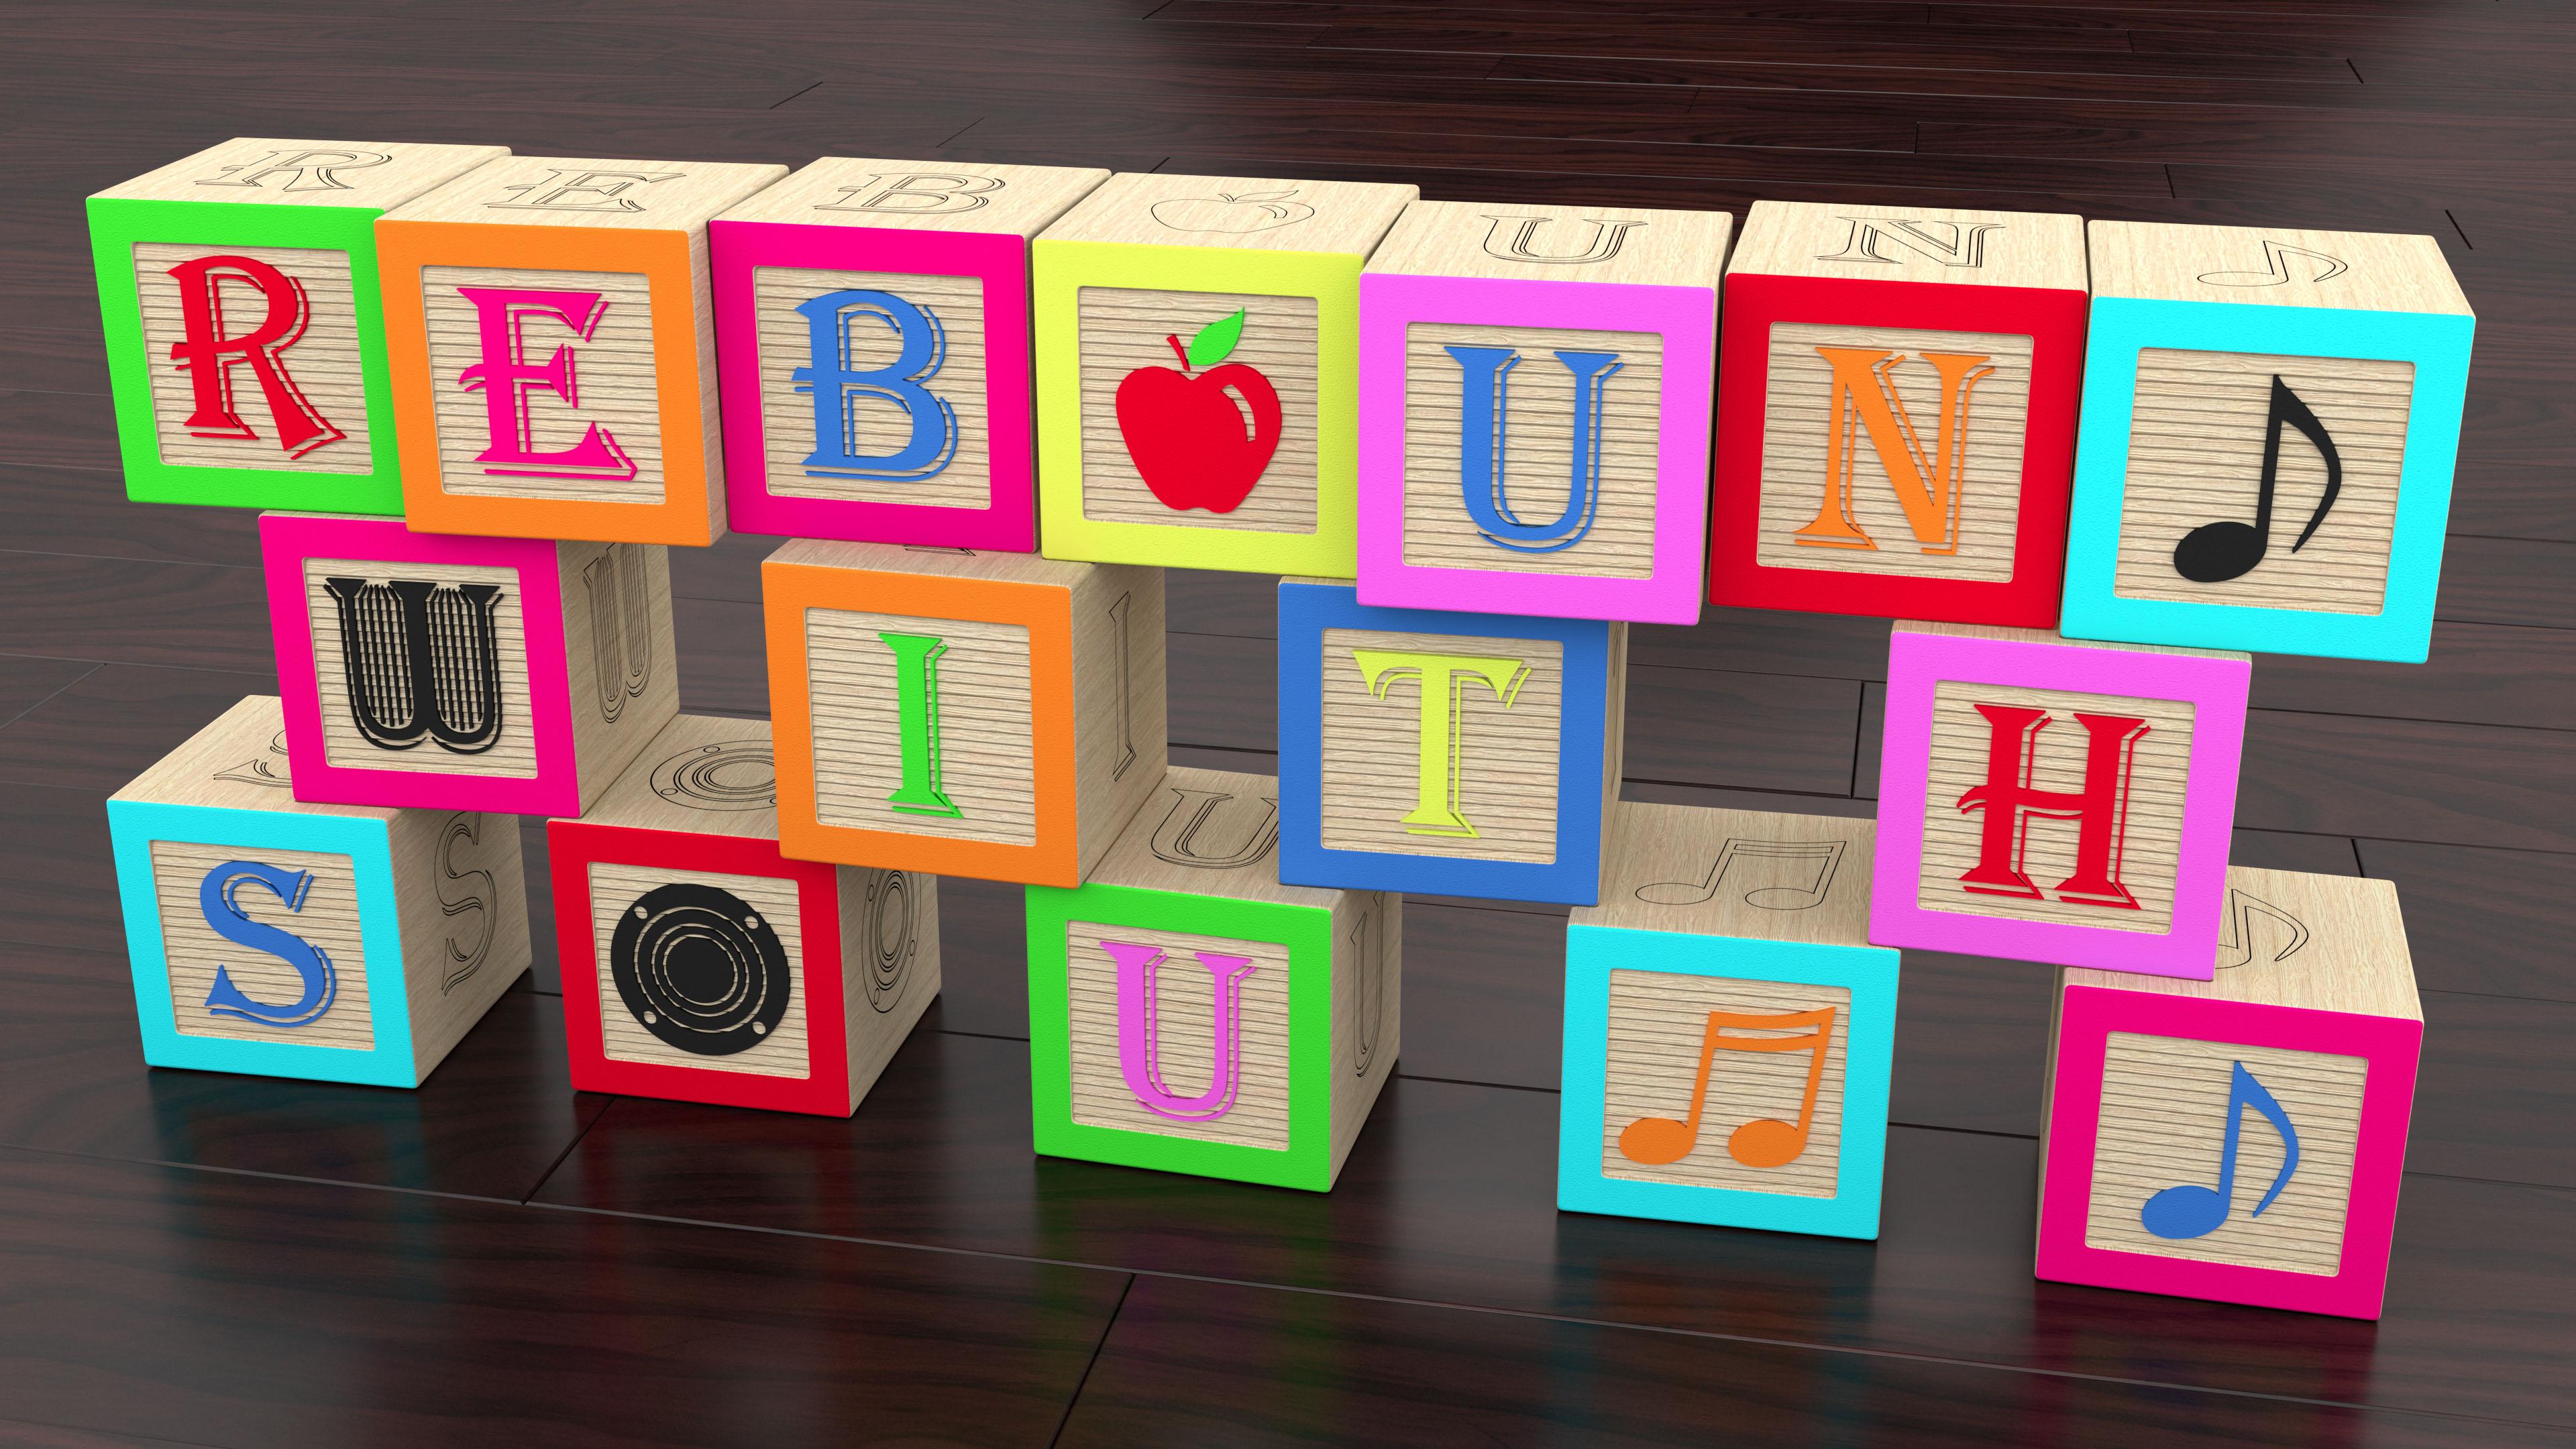 Rebound with Sound logo spelled with kids building toy blocks